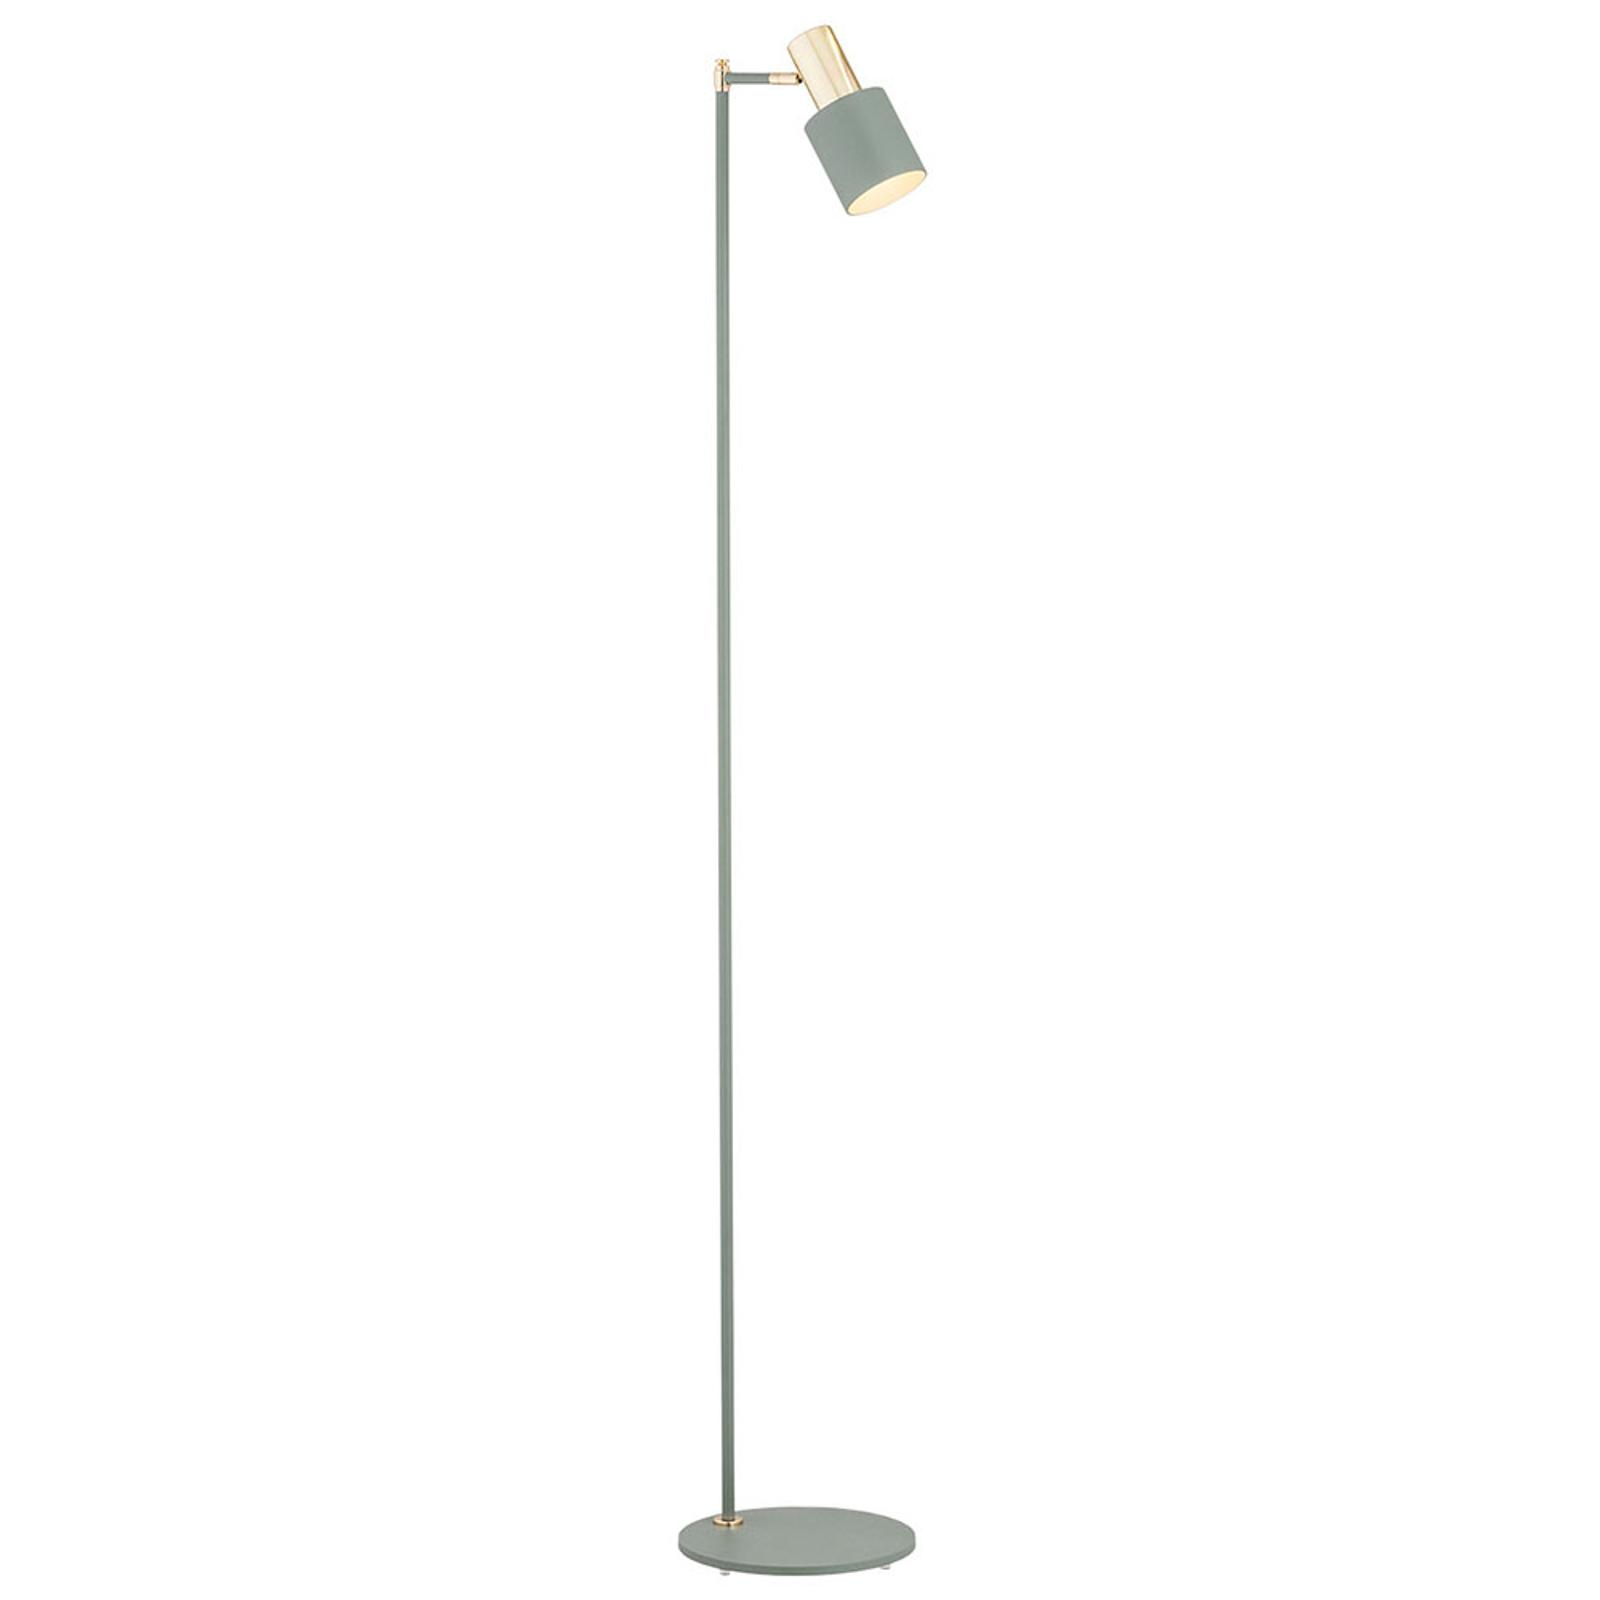 Destin standerlampe, justerbar, grøn/messing